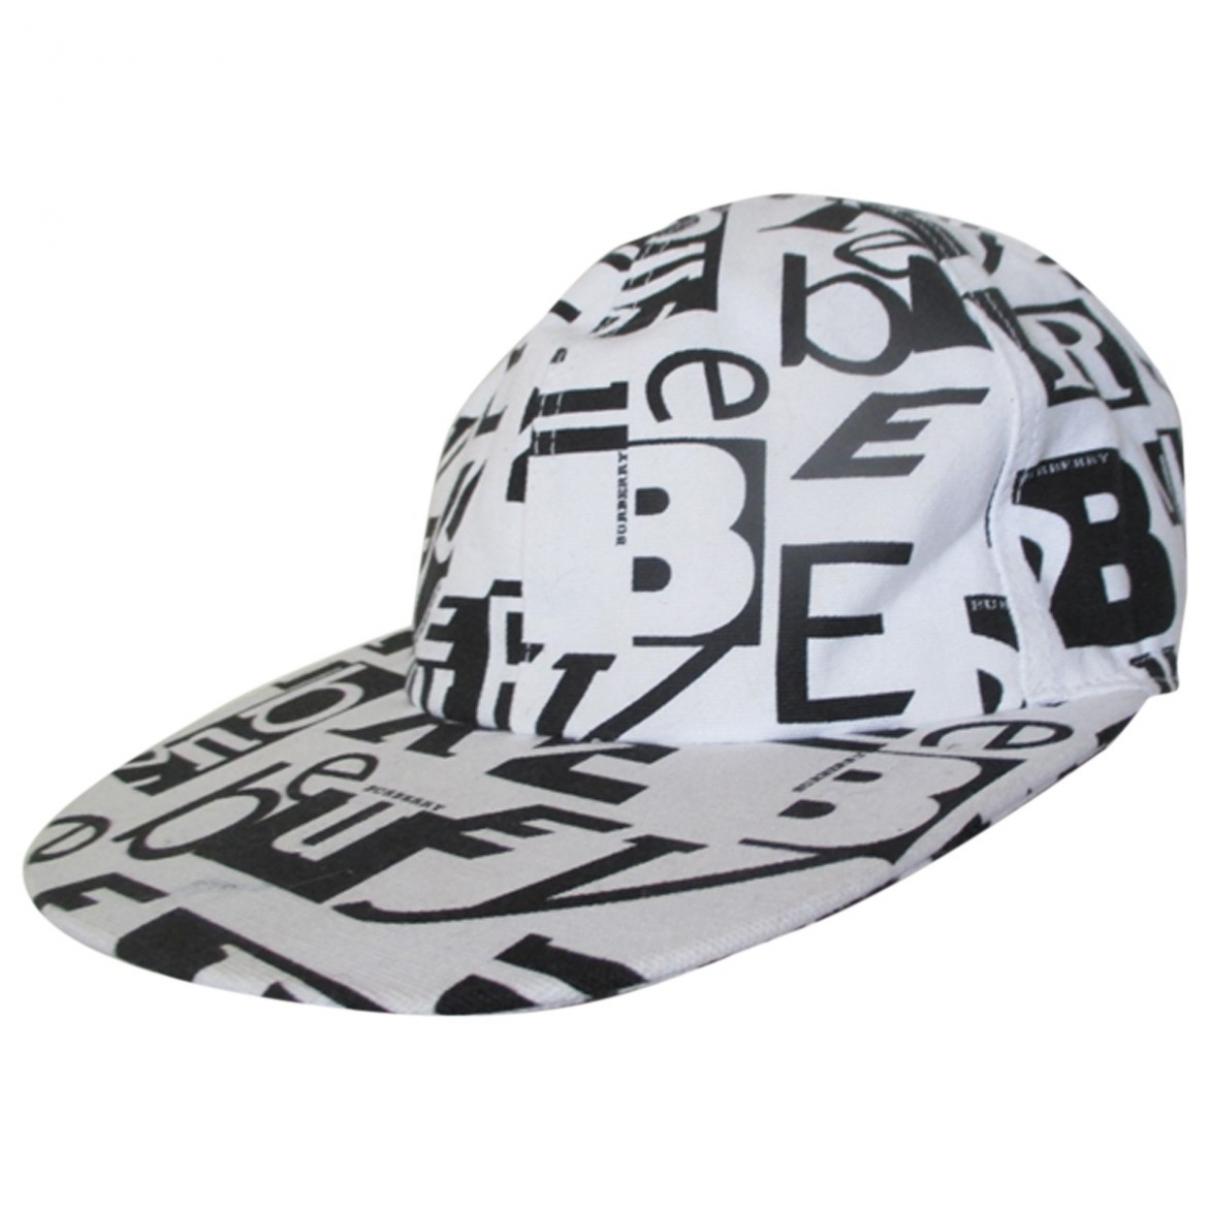 Burberry \N White Cotton hat for Women M International